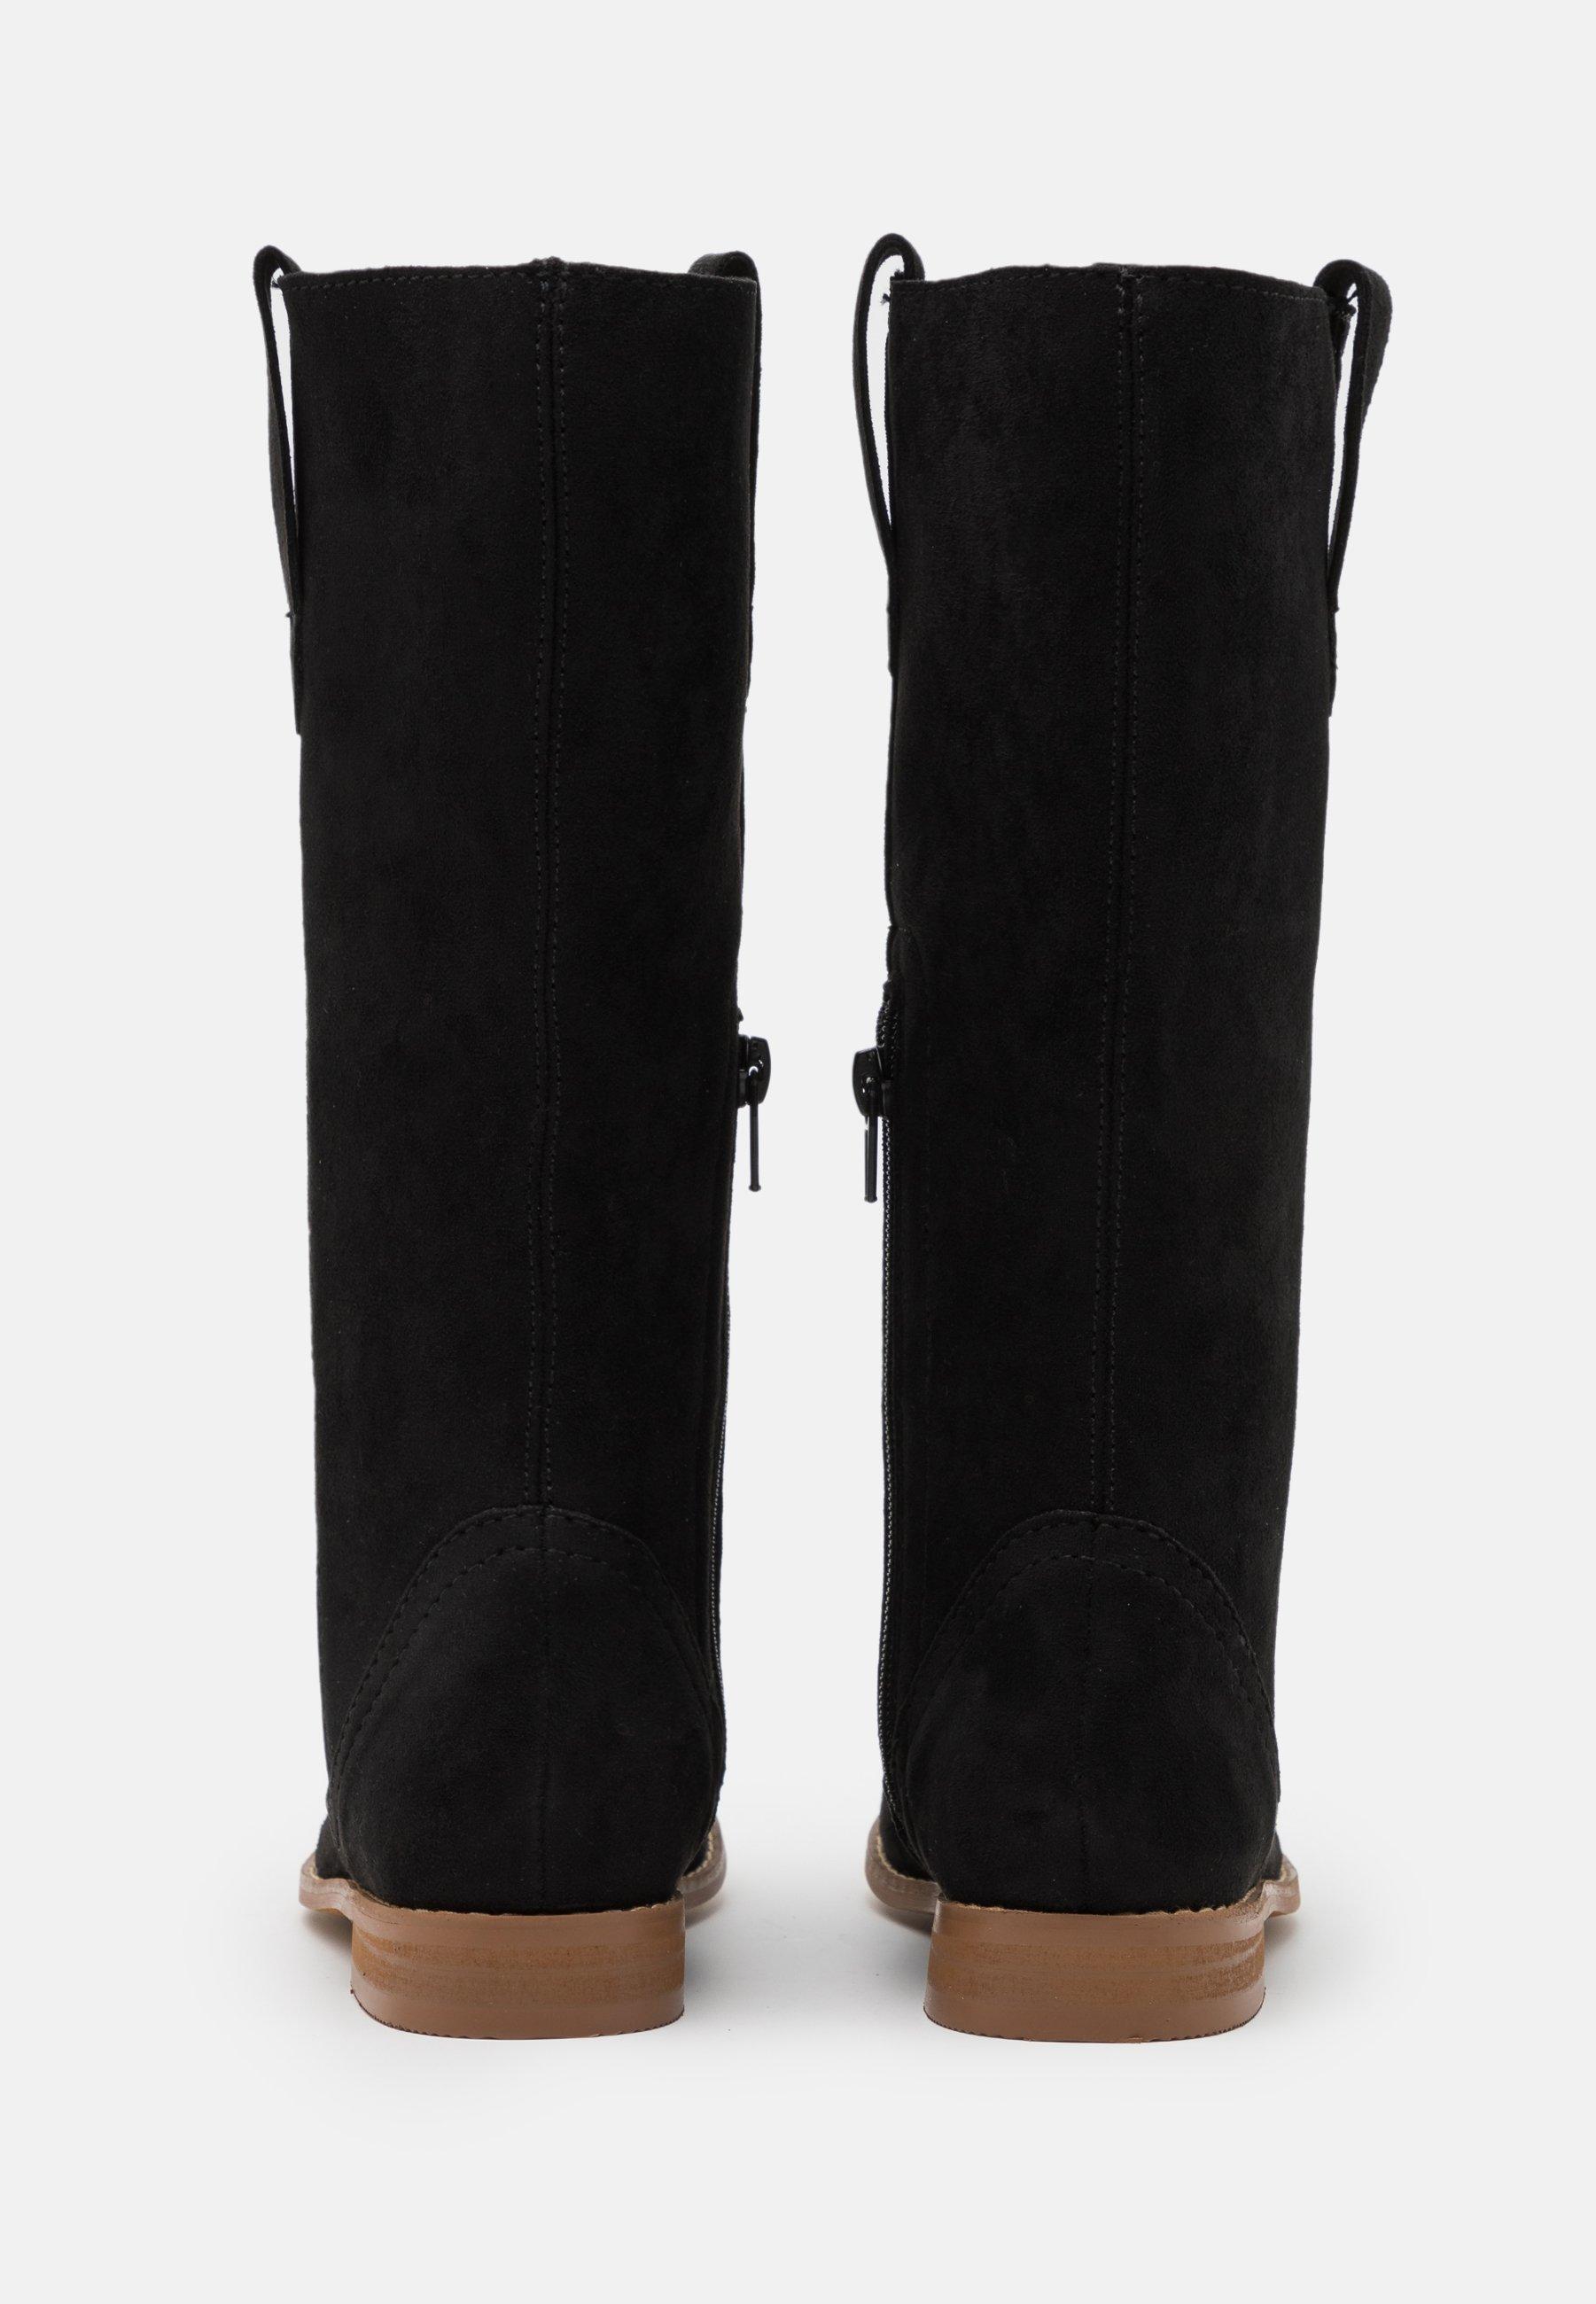 Enfant KNEE HIGH SLOUCH BOOT - Bottes